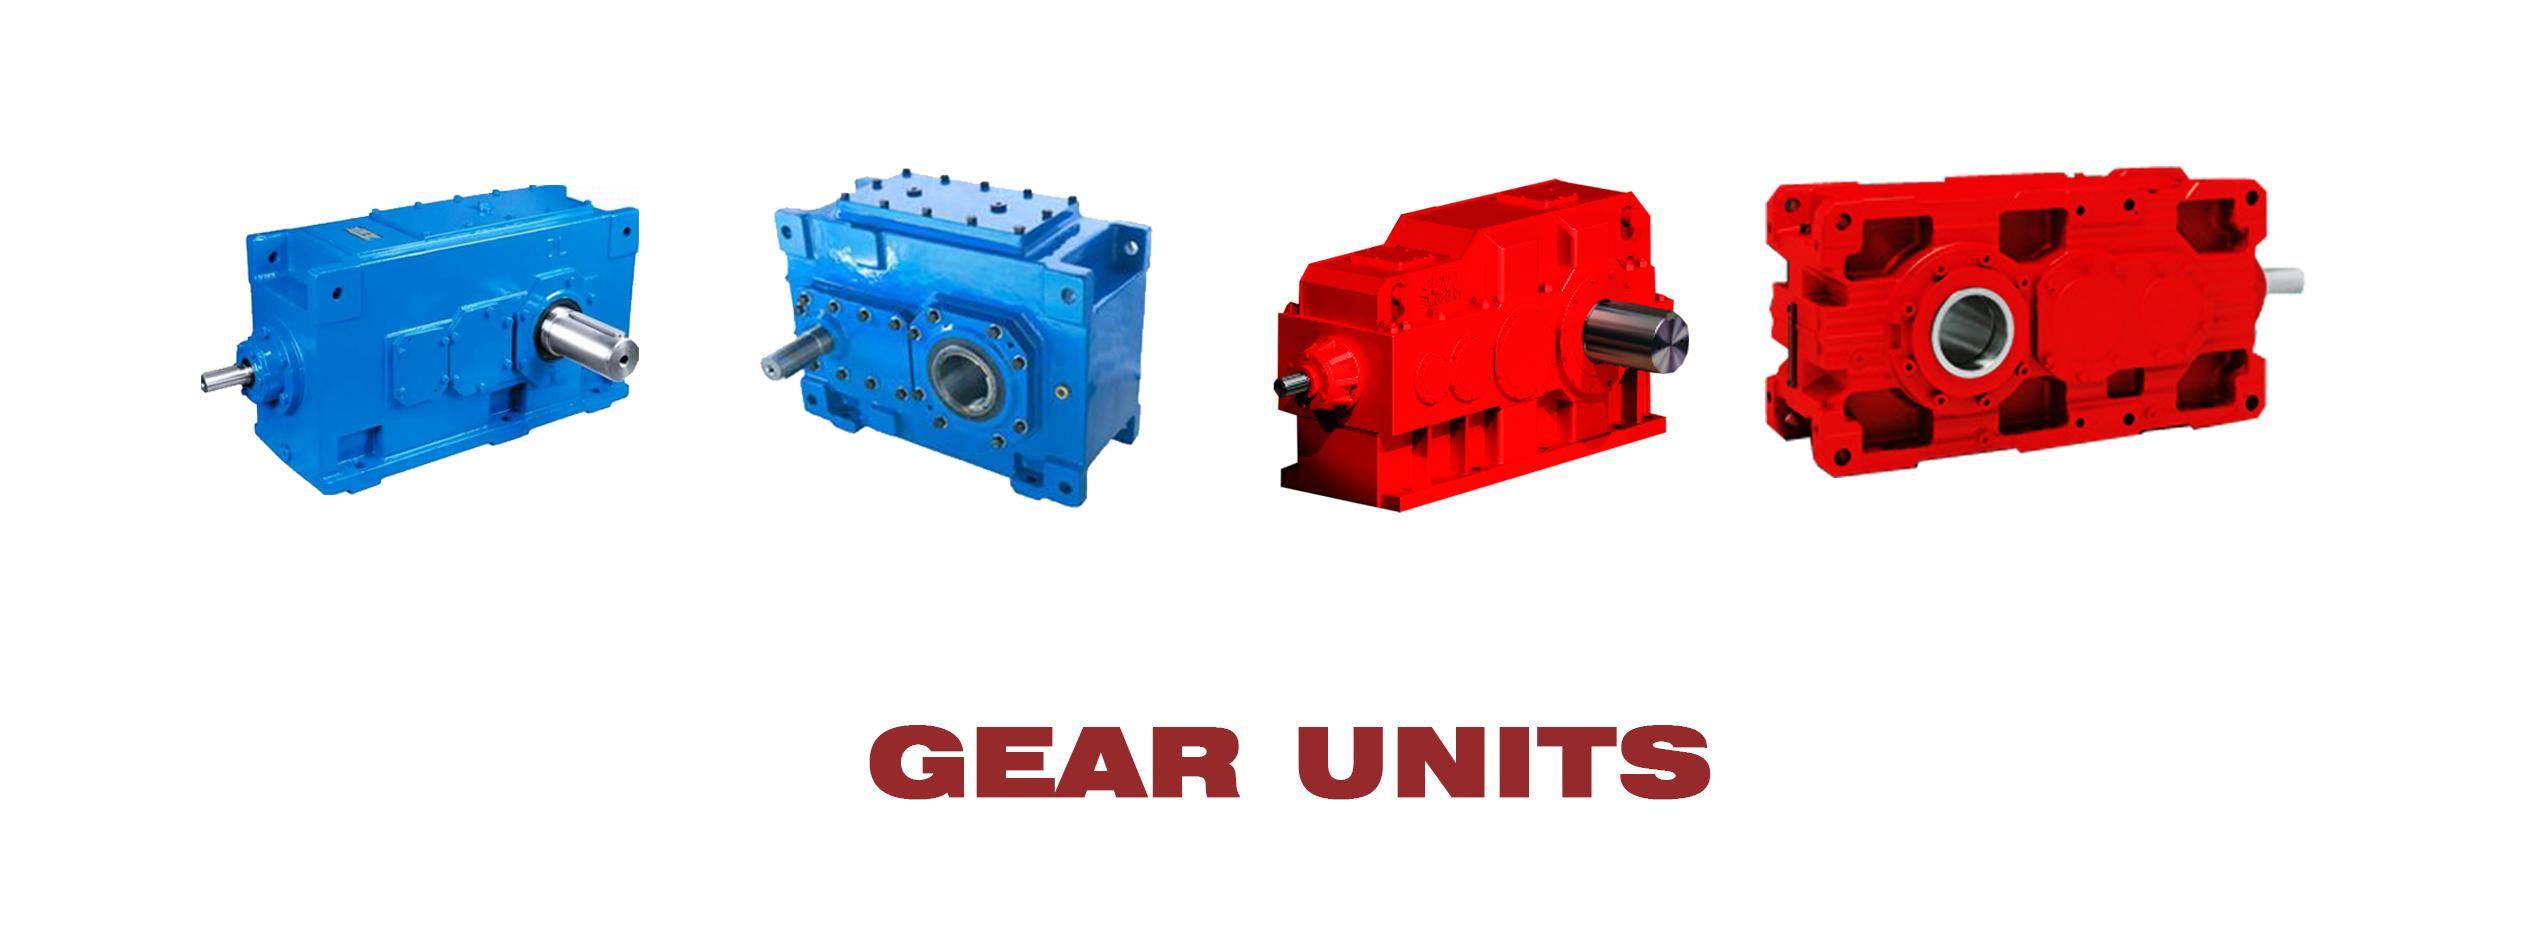 Gear-Reducer